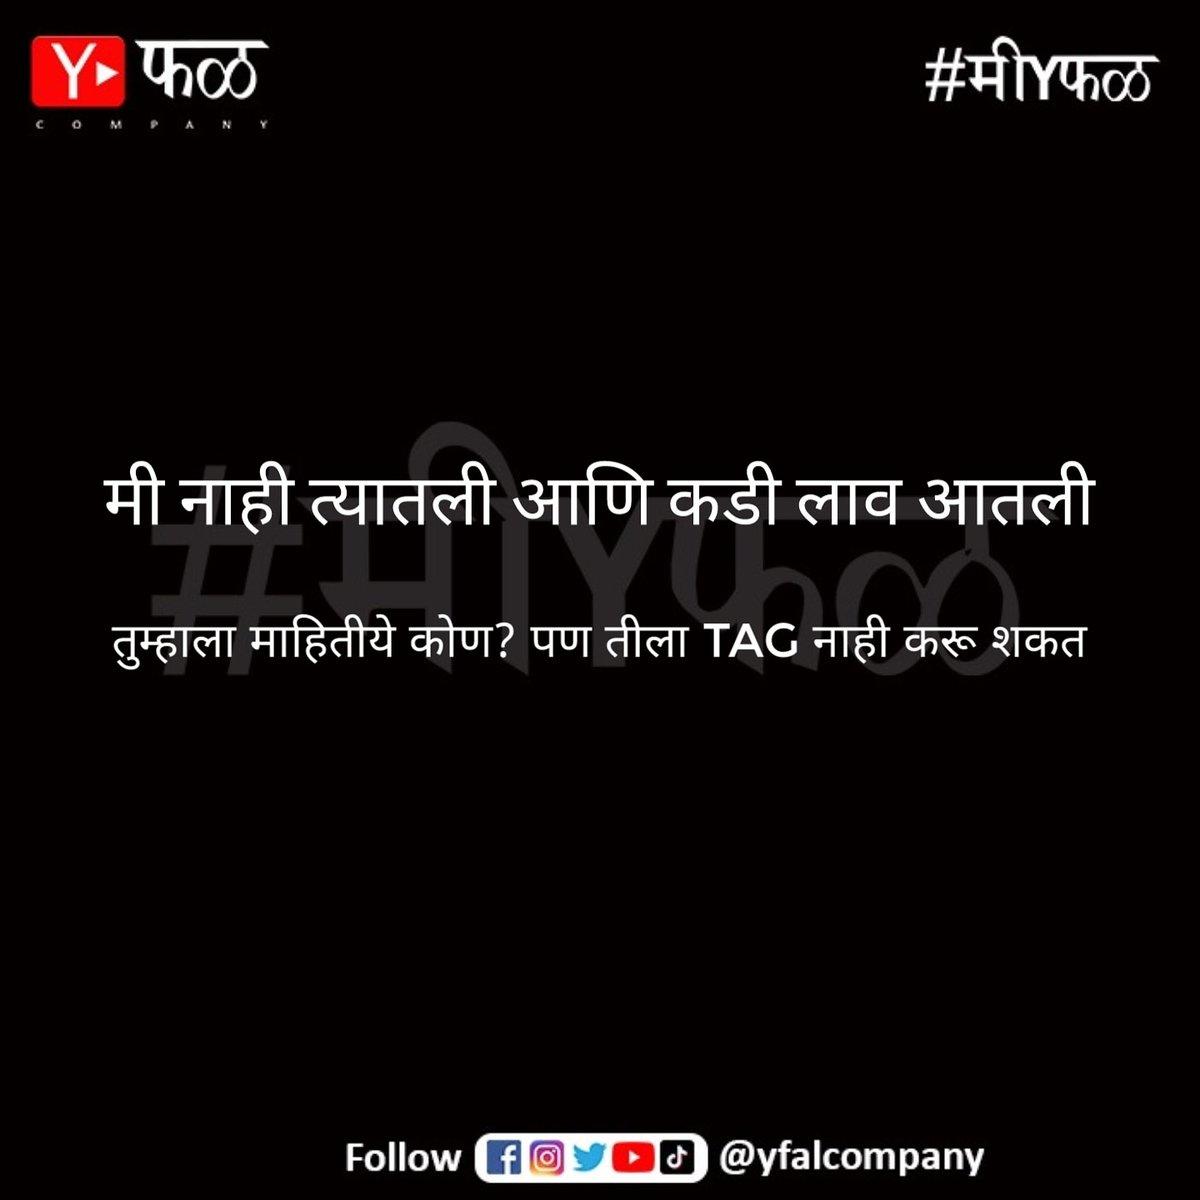 #मीYफळ #YFalCompany  #marathicomedy marathimeme#gf #bf #bff #friends #marathimhani #marathimhaniofficials ##tag #marathimotivational #marathijokespic.twitter.com/96BDcmLx3q